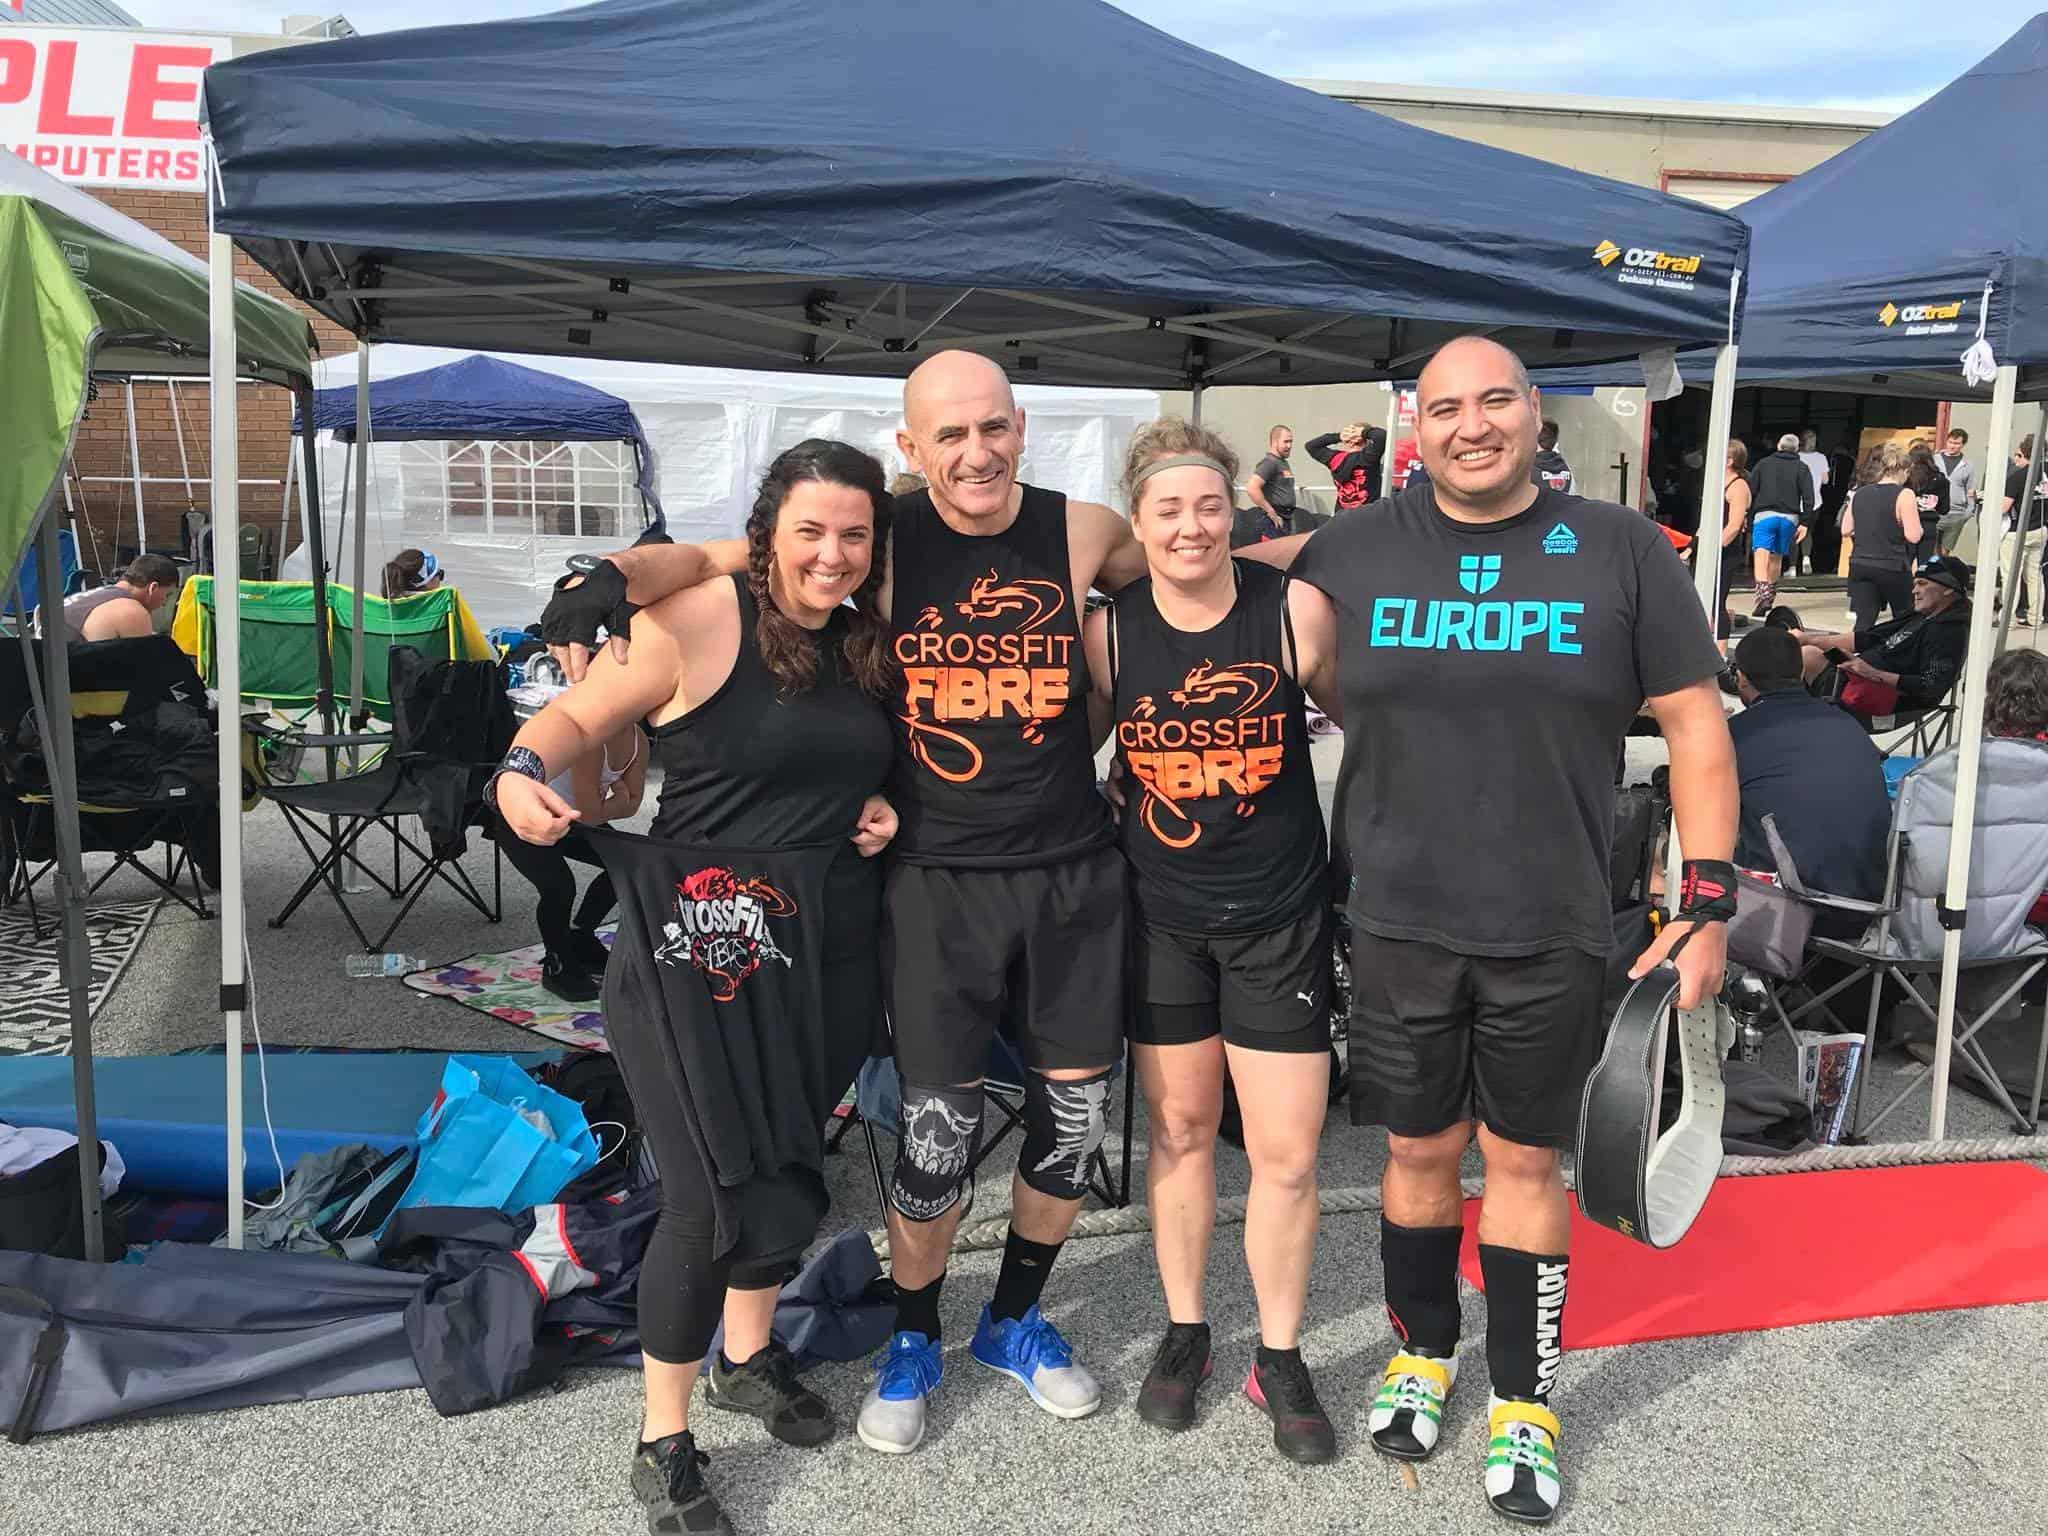 Masters CrossFIt CrossFit Fibre Athletes